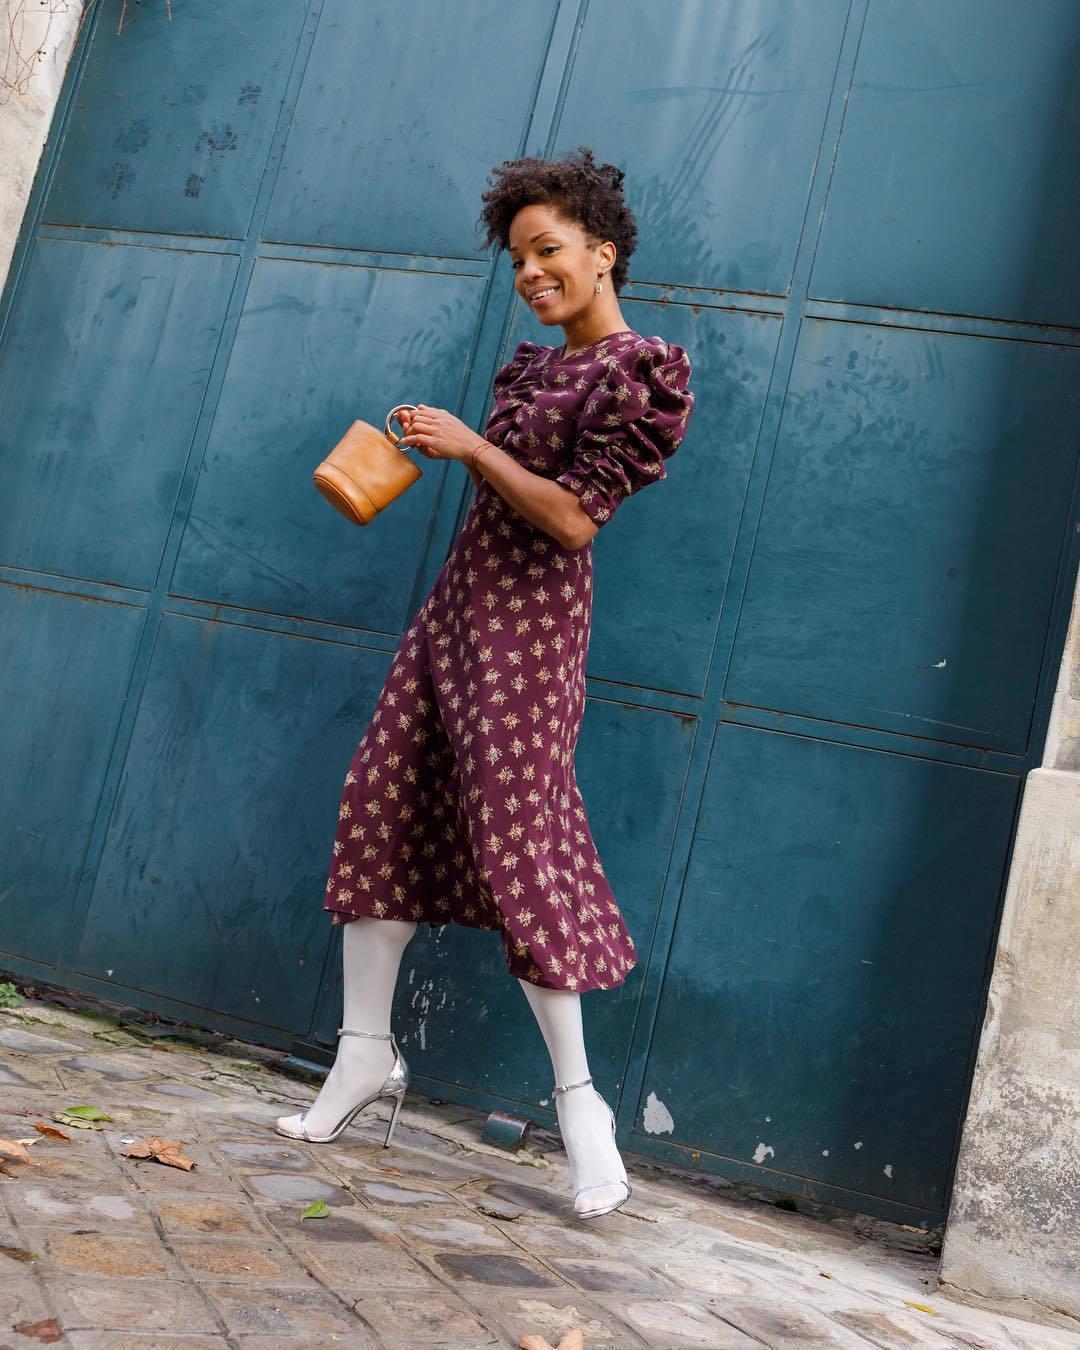 bag handbag brown bag tights midi dress floral dress puffed sleeves